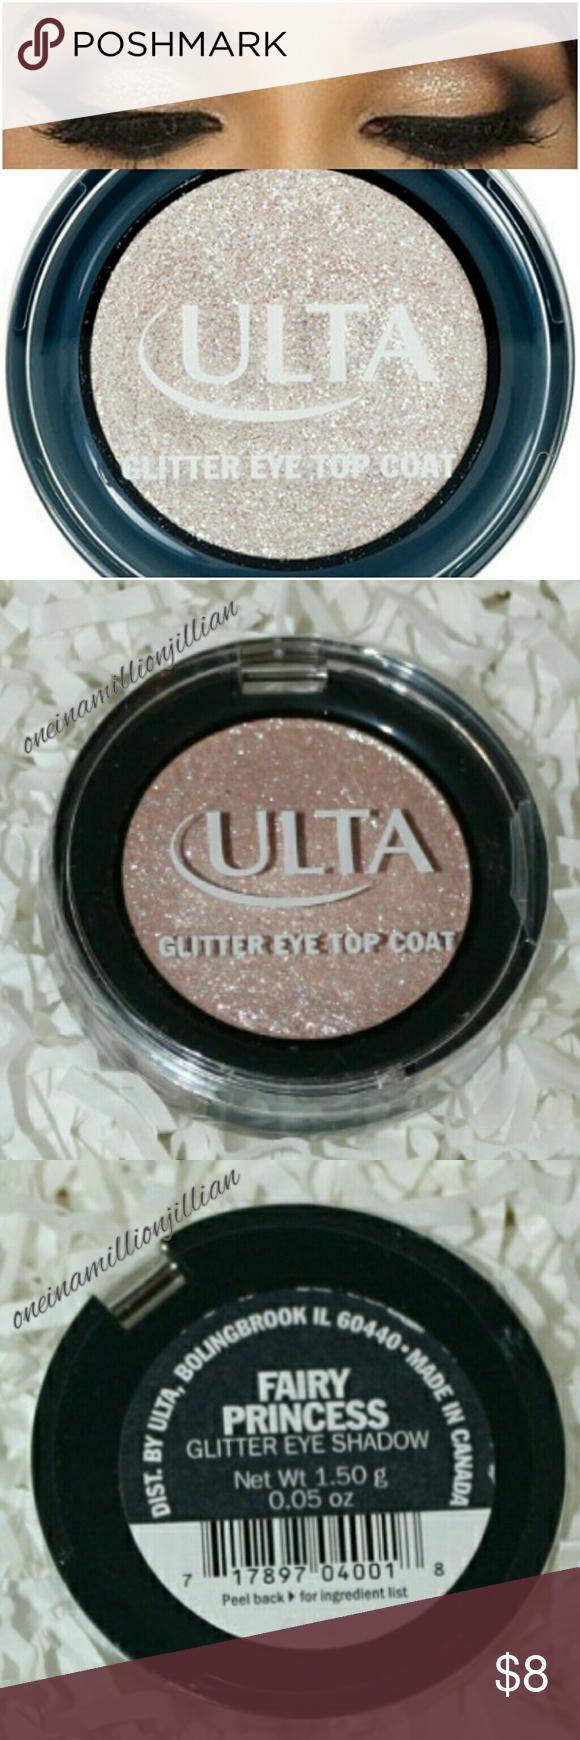 RESTOCK Ulta Glitter Eye Top Coat Fairy Princess